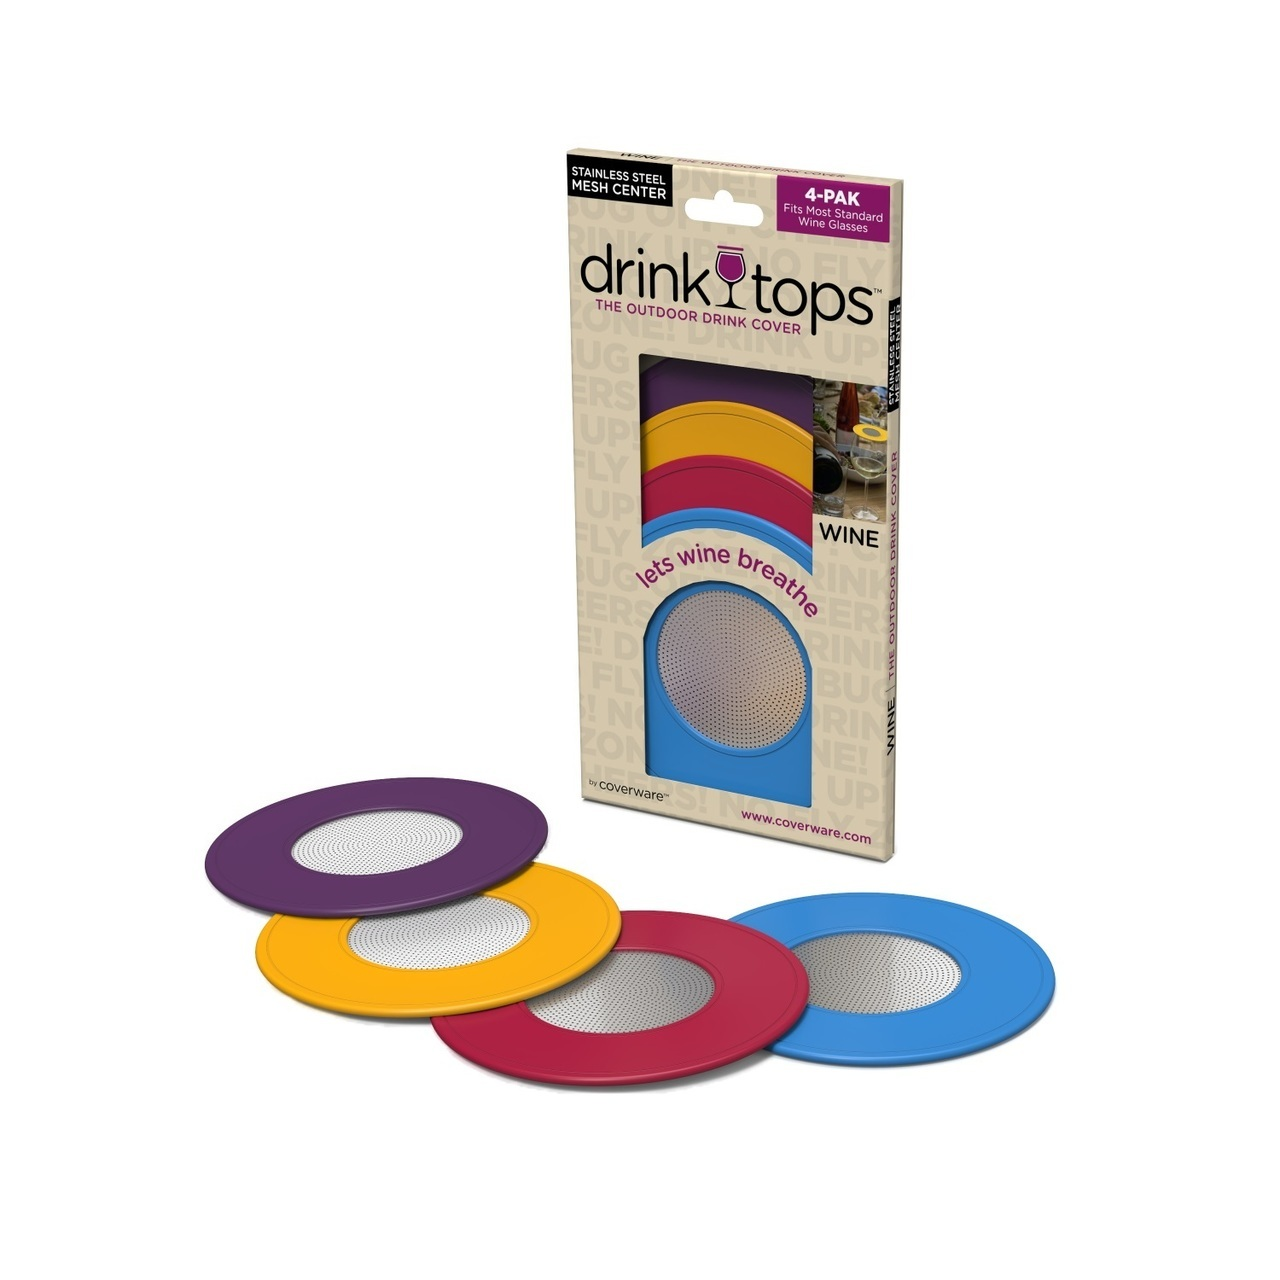 https://d3d71ba2asa5oz.cloudfront.net/23000296/images/drink-tops-outdoor-wine-glass-covers-4pk-assorted-colors-casku17933.jpg